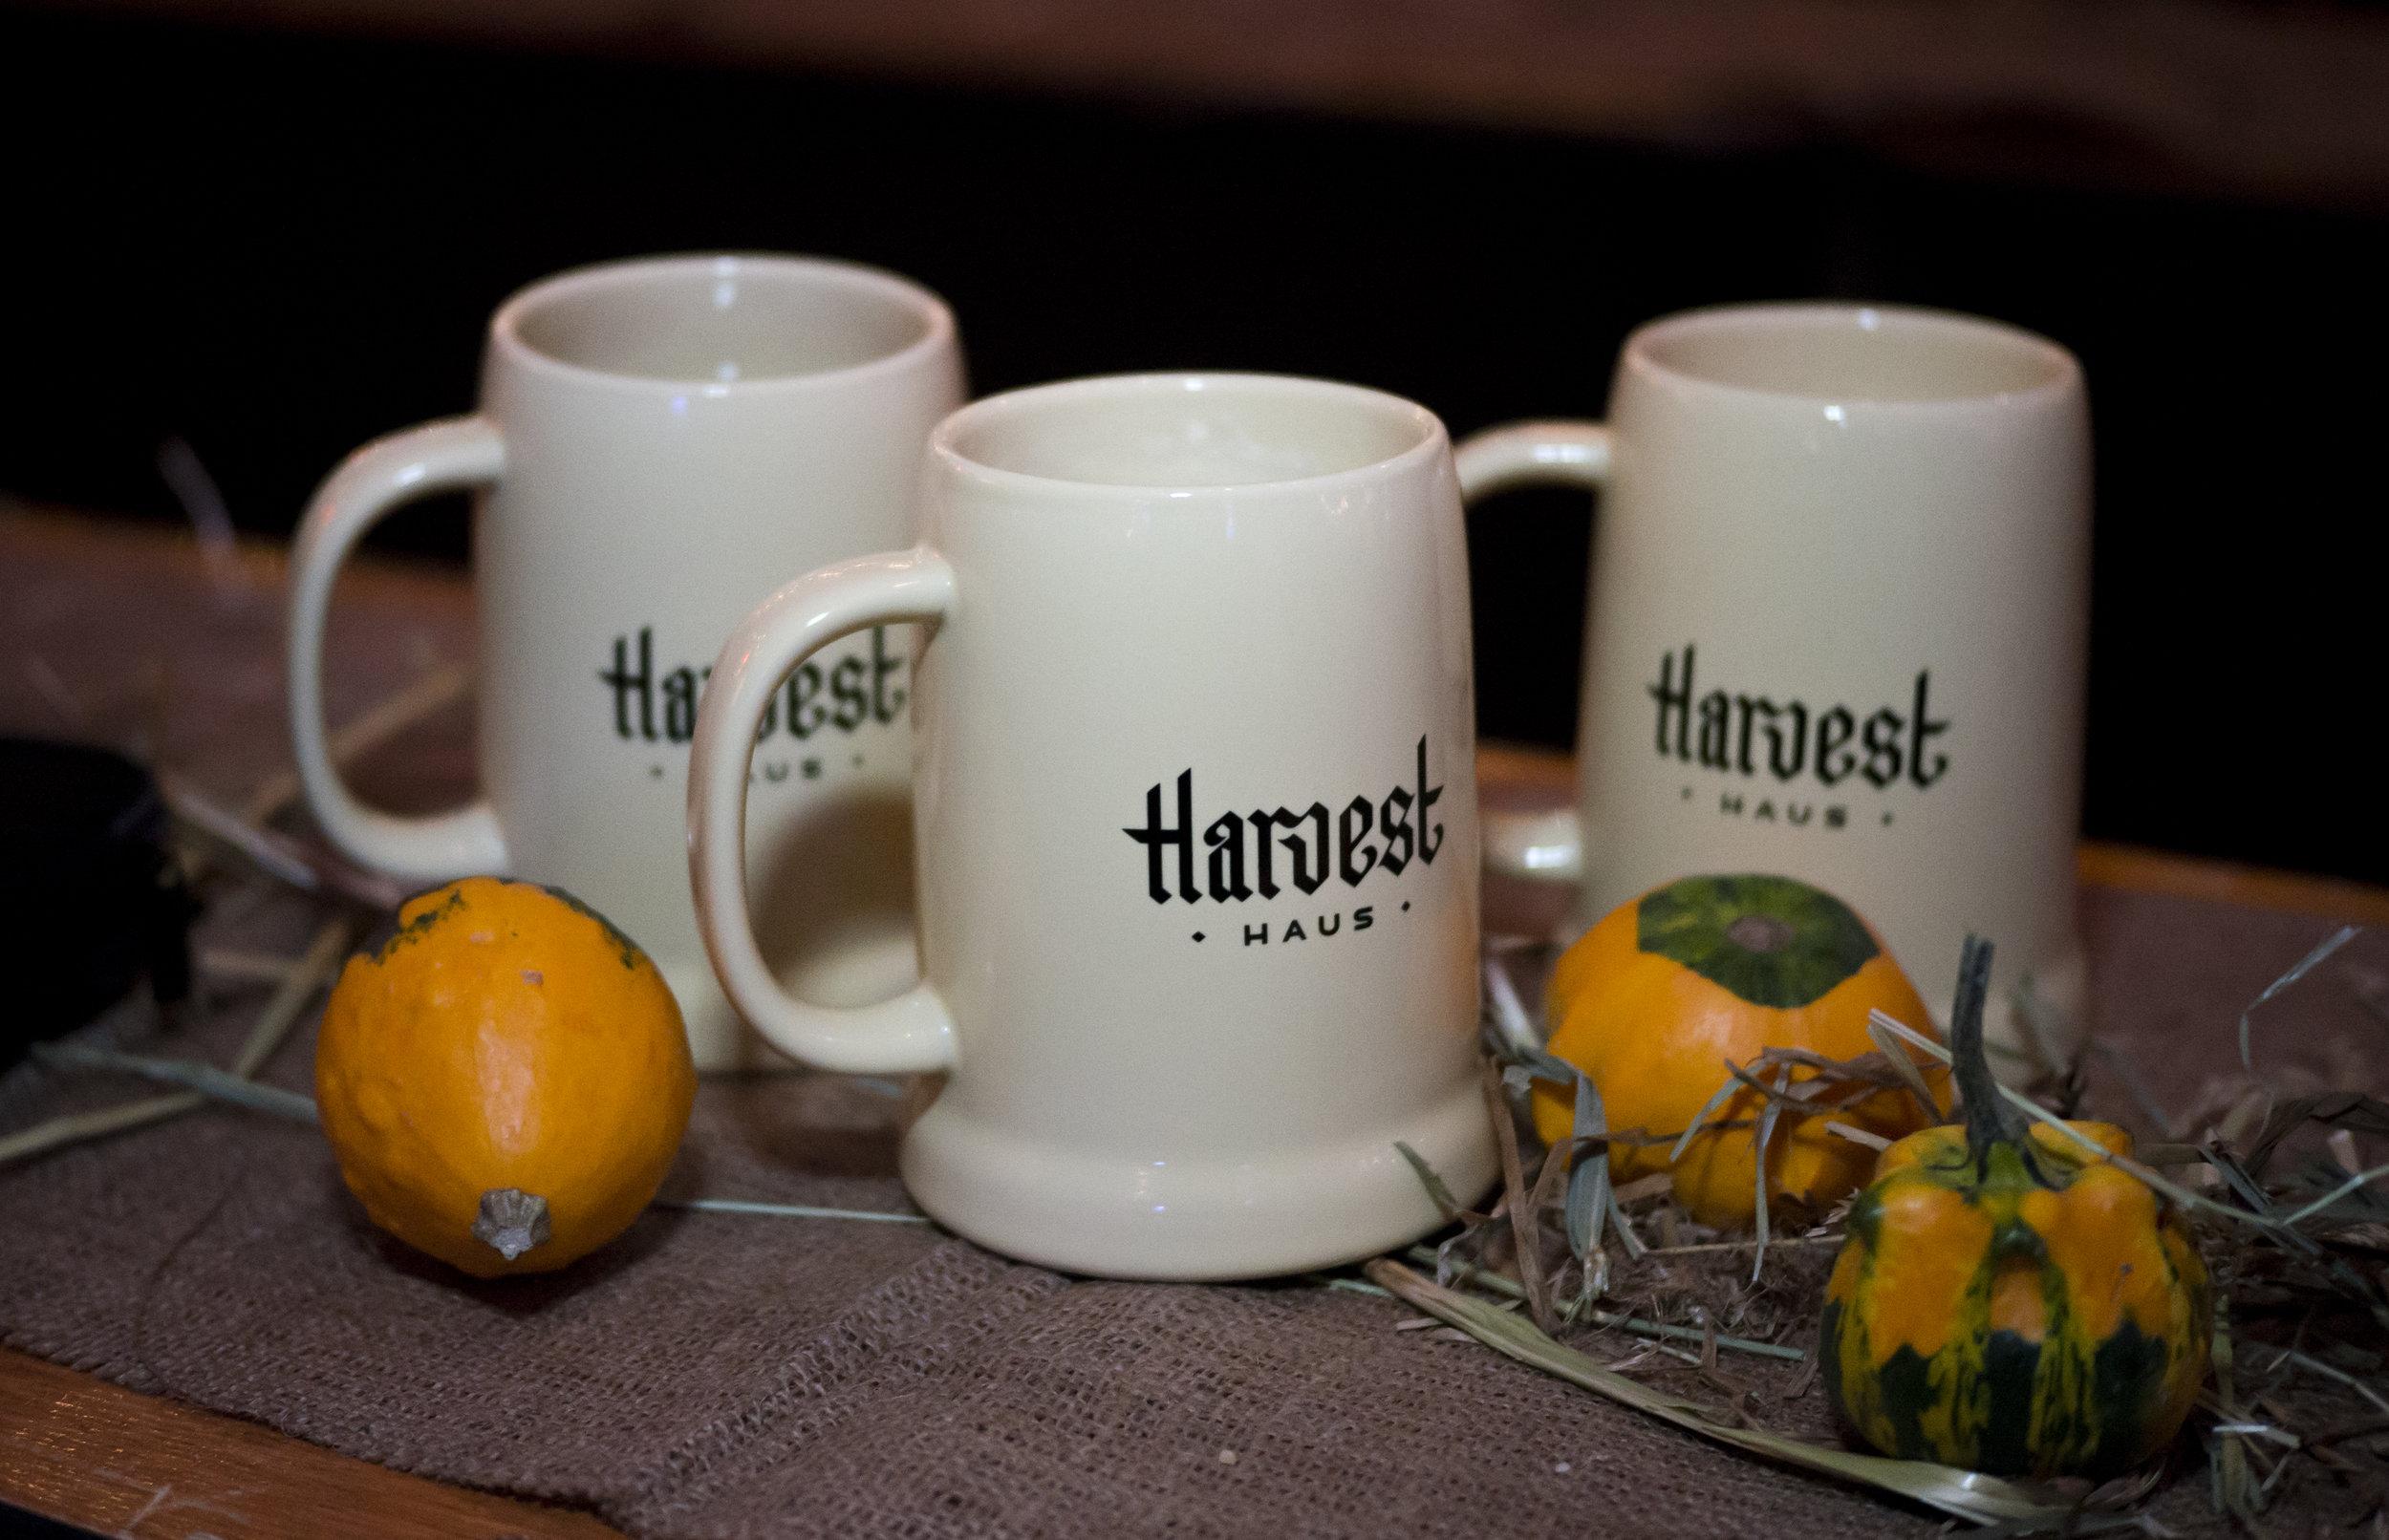 harvesthaus.1015.jpg